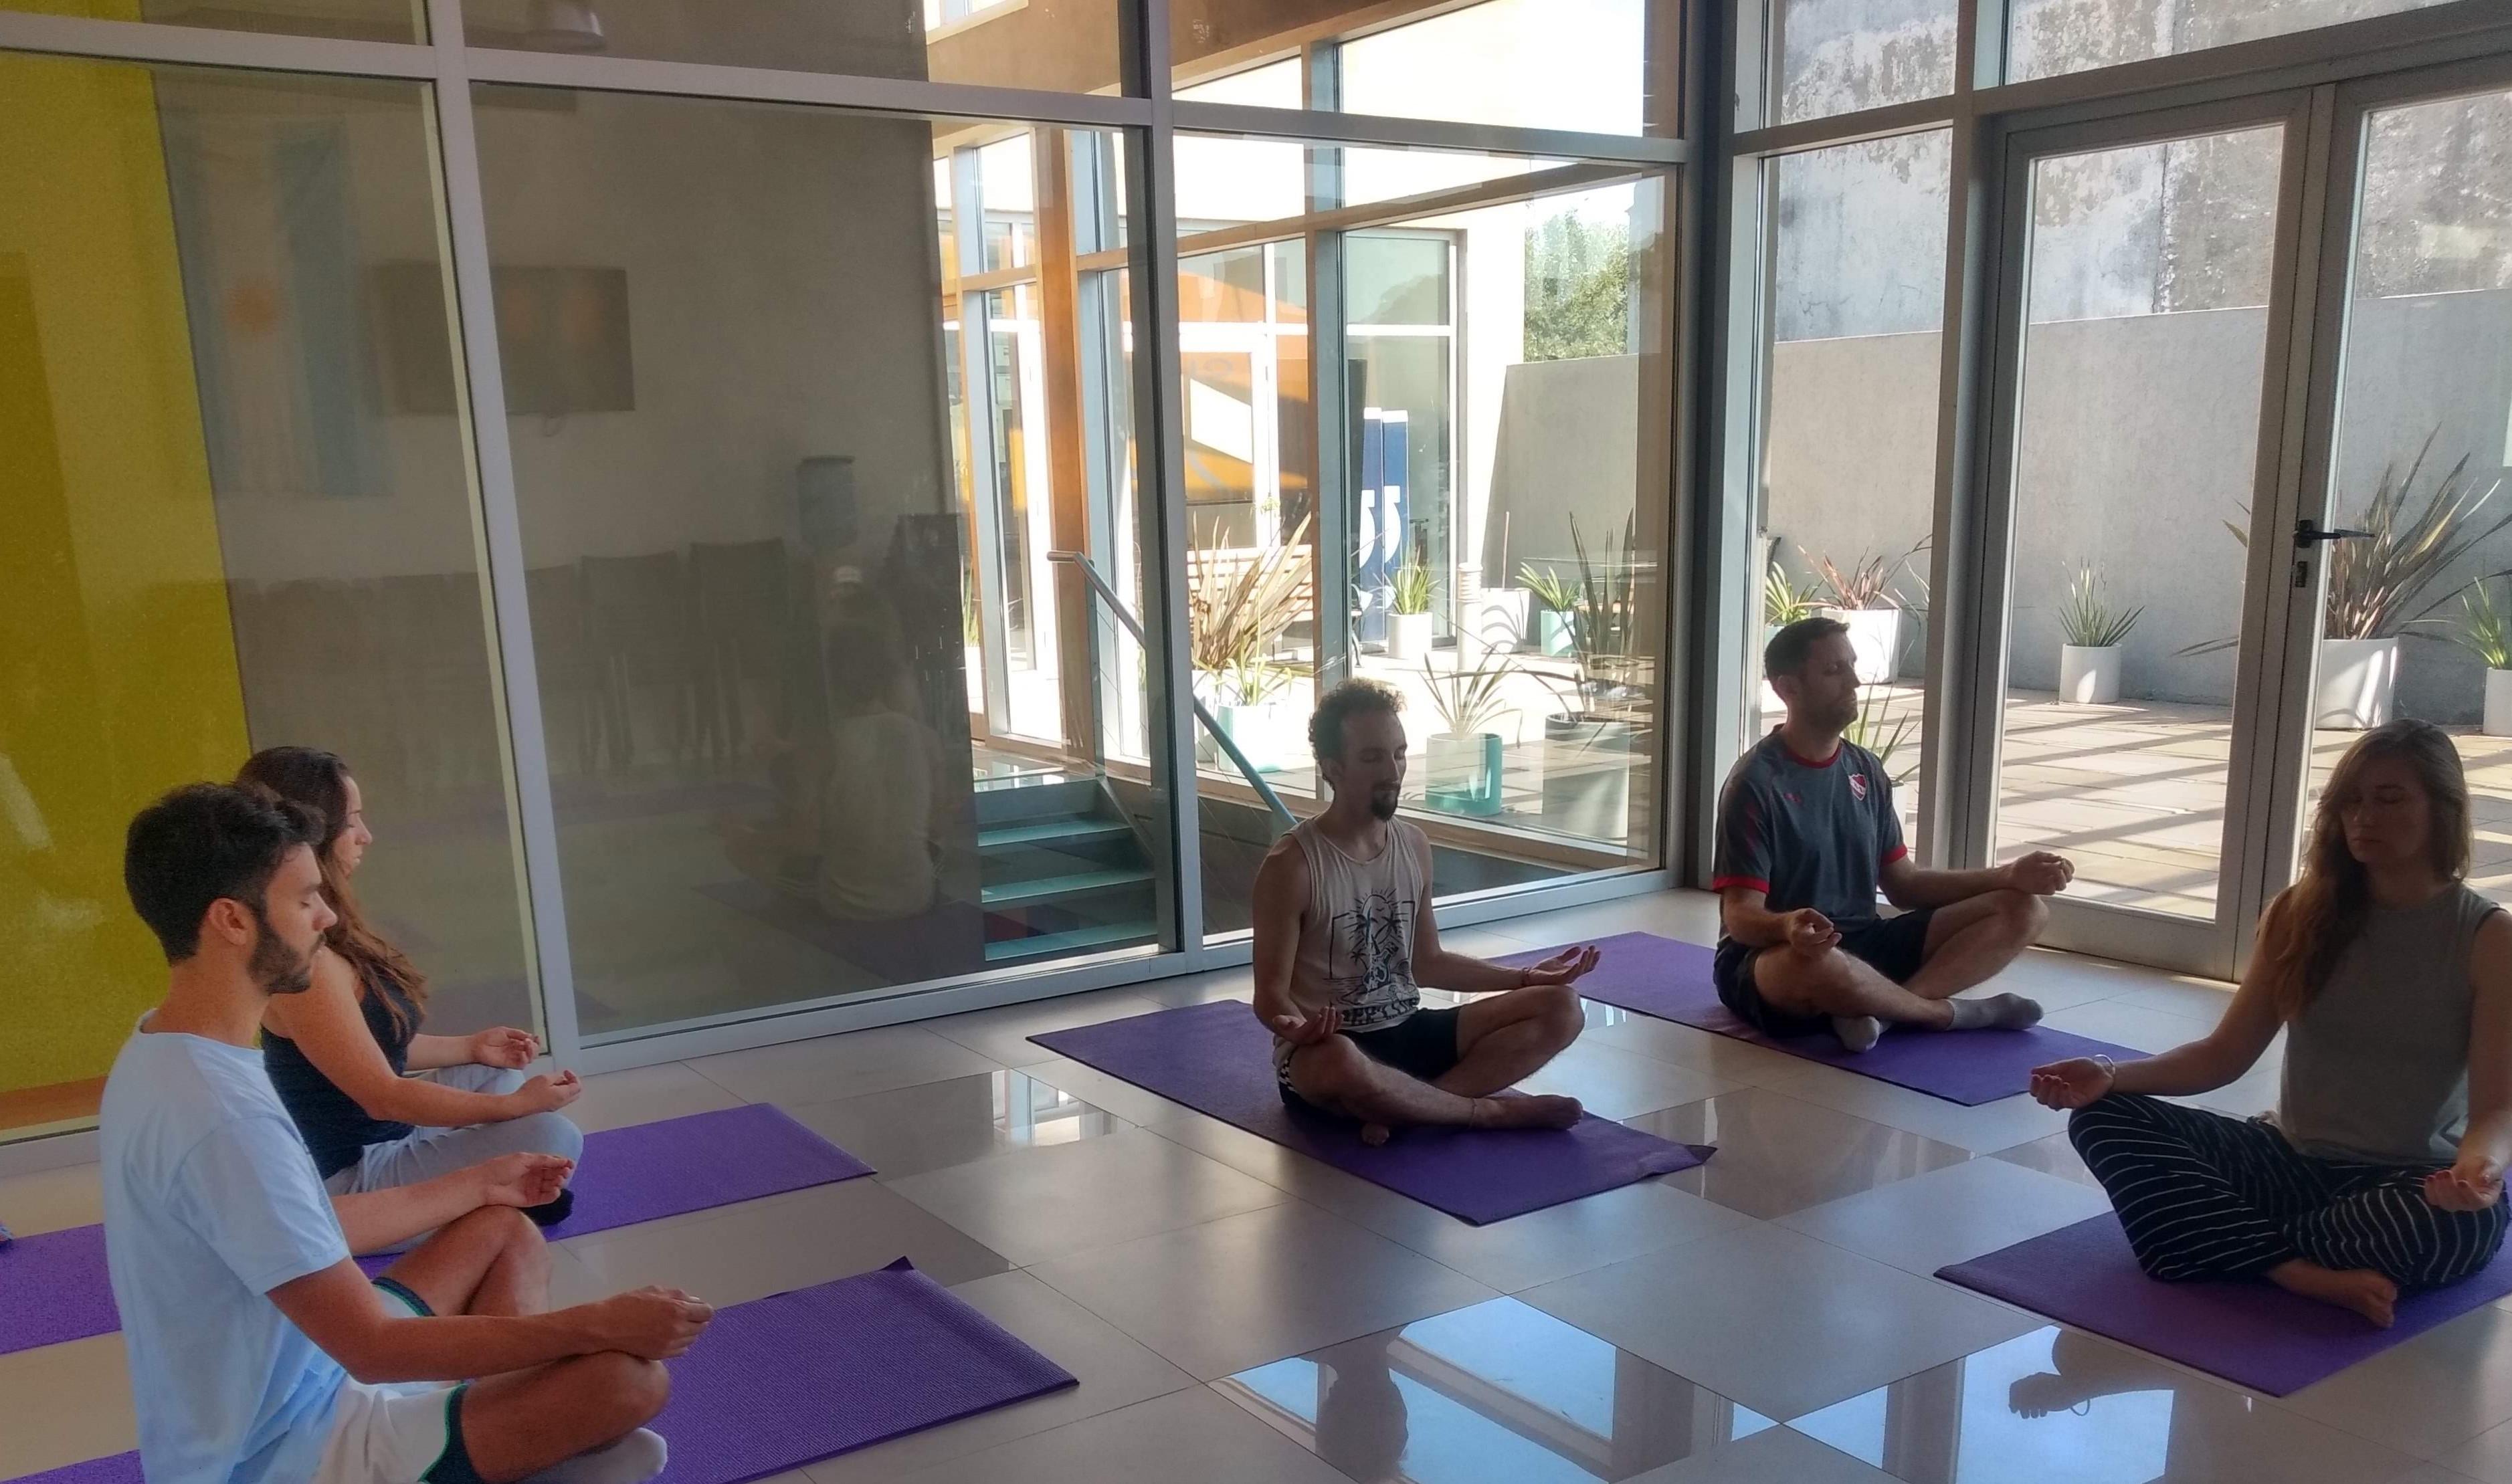 Clases de Yoga para empresas en cuarentena